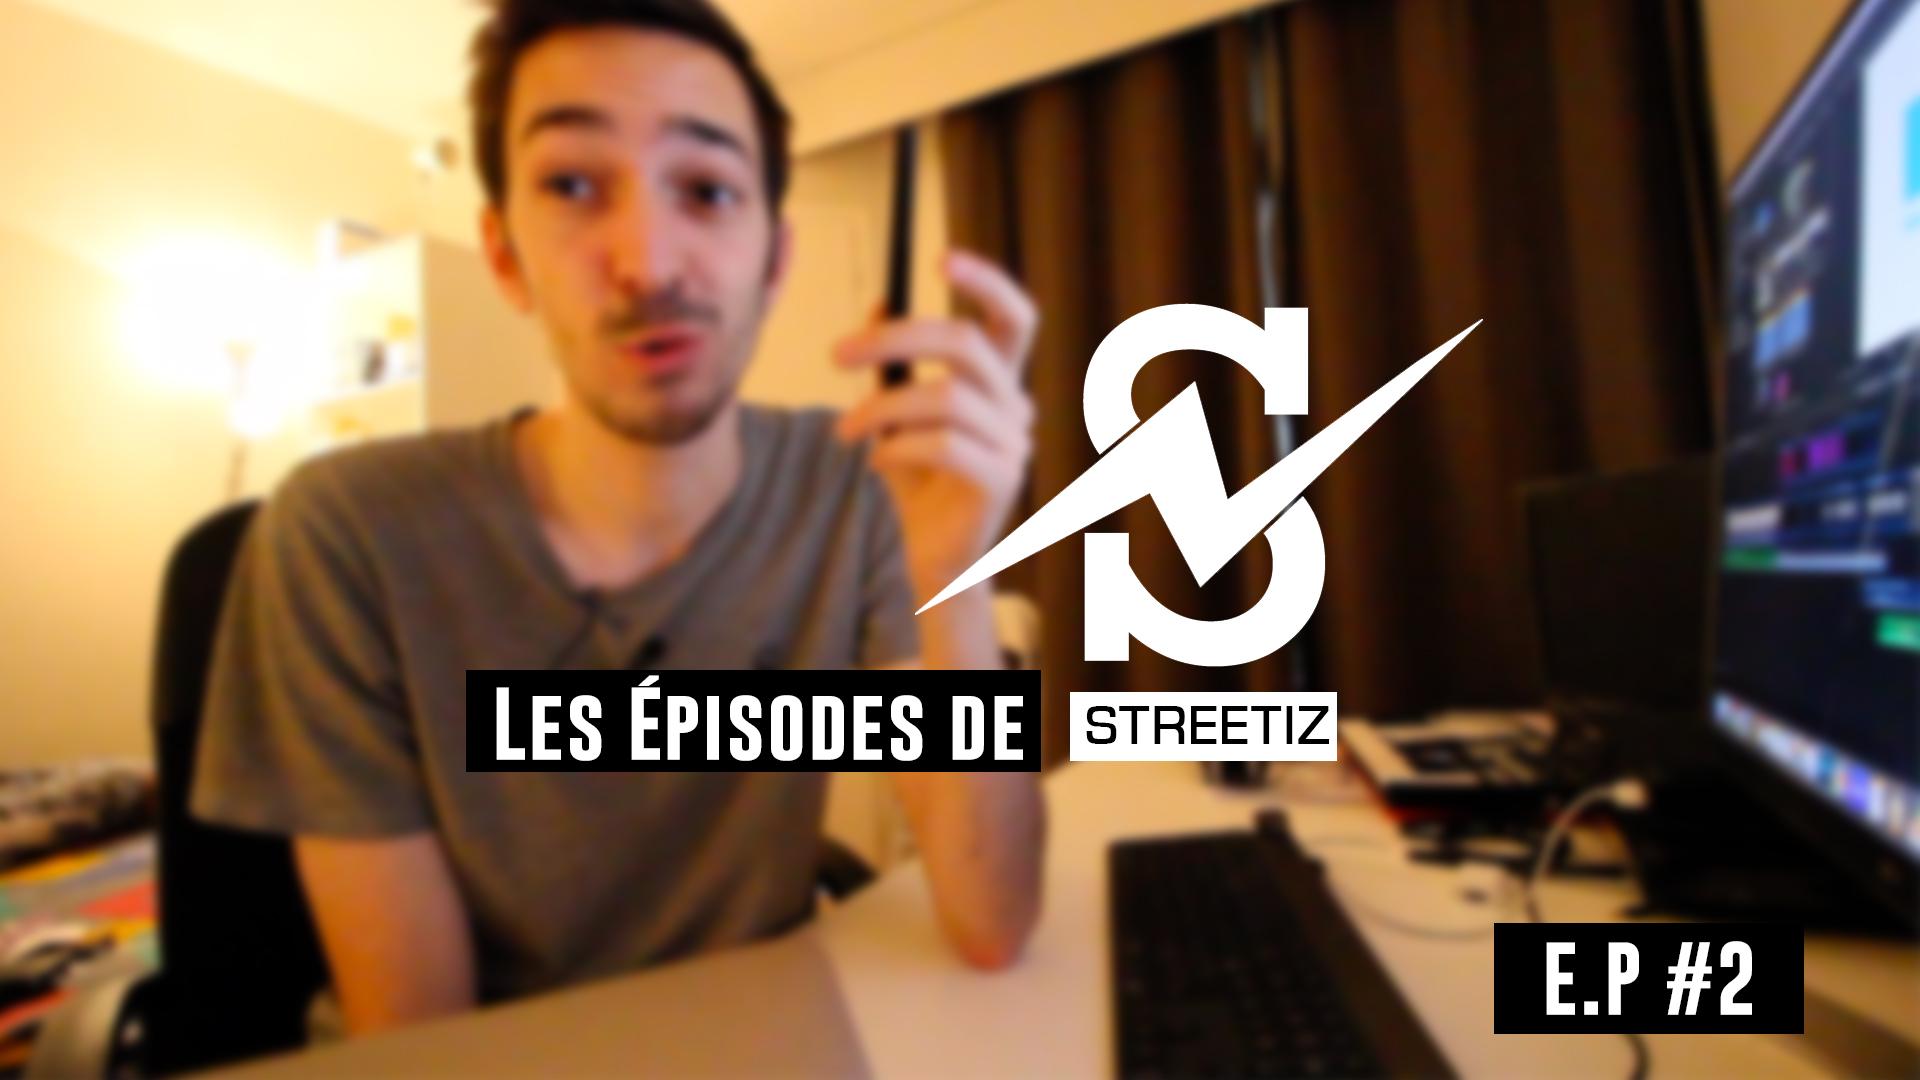 Photo of Les Episodes de Streetiz #2